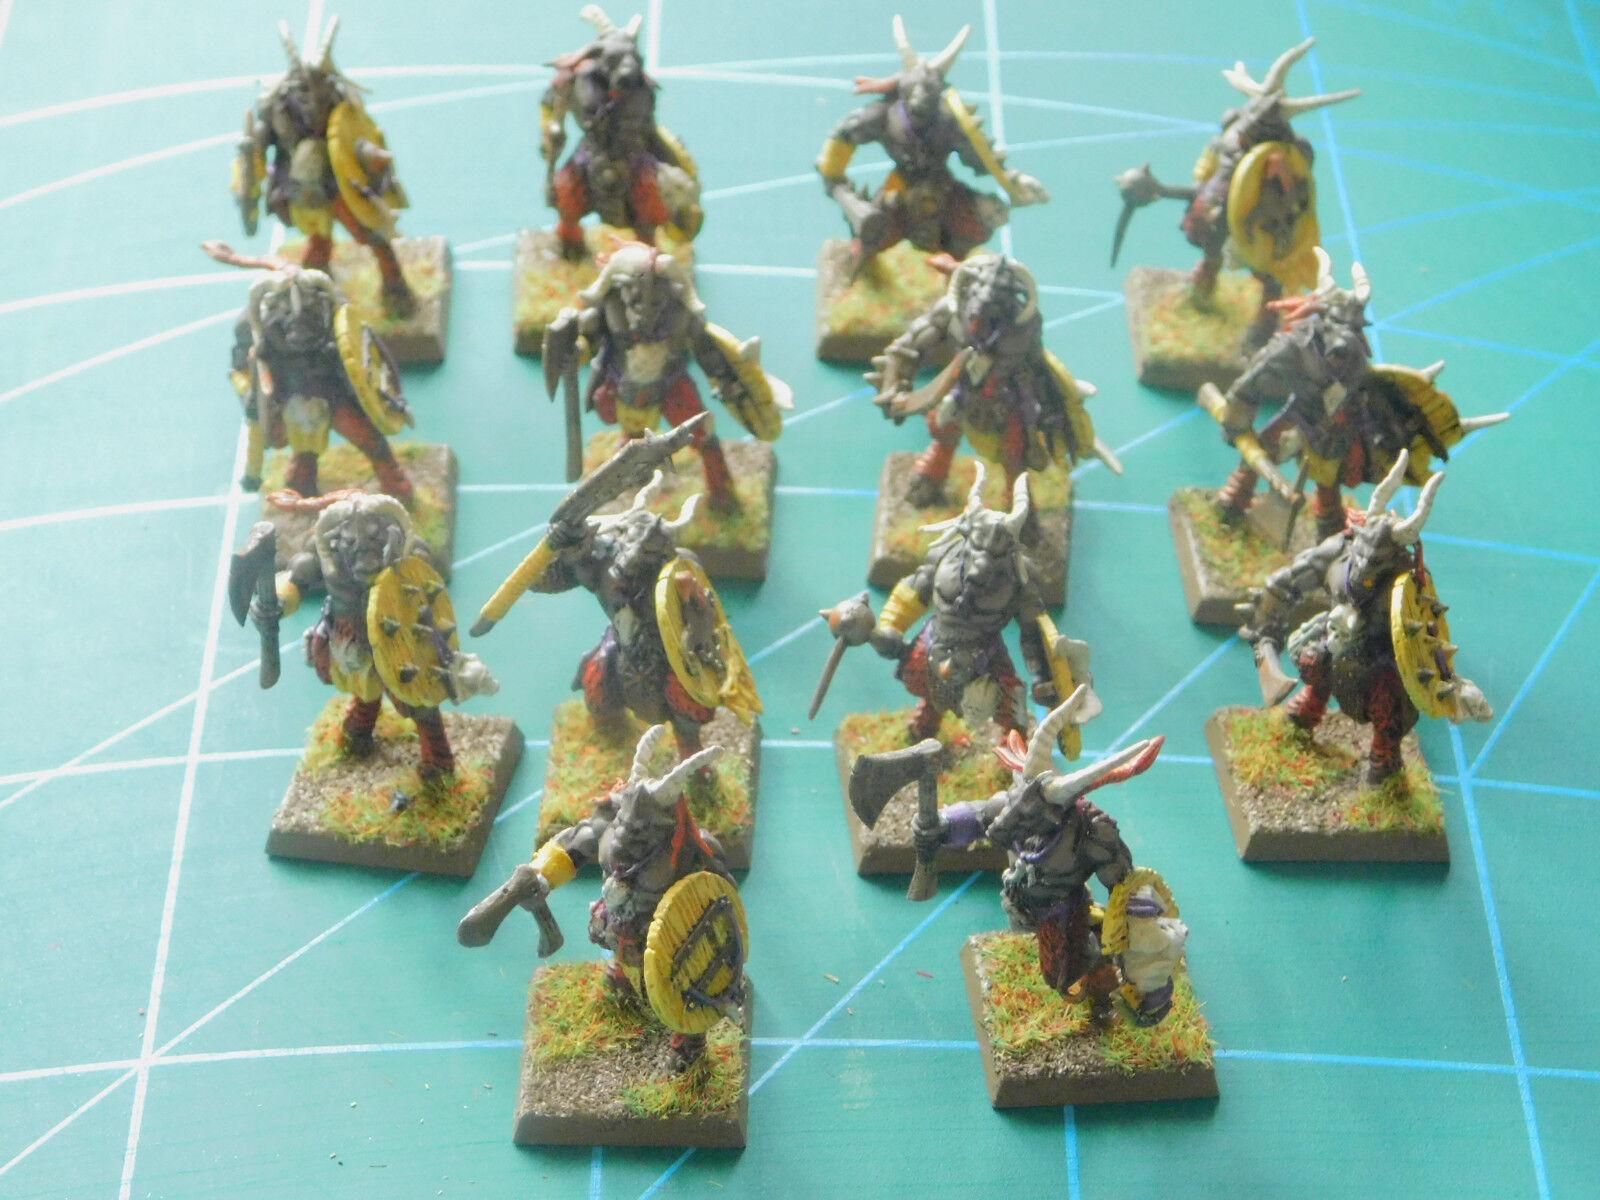 14 warhammer 40k dungeons dragons beast creature painted plastic figures